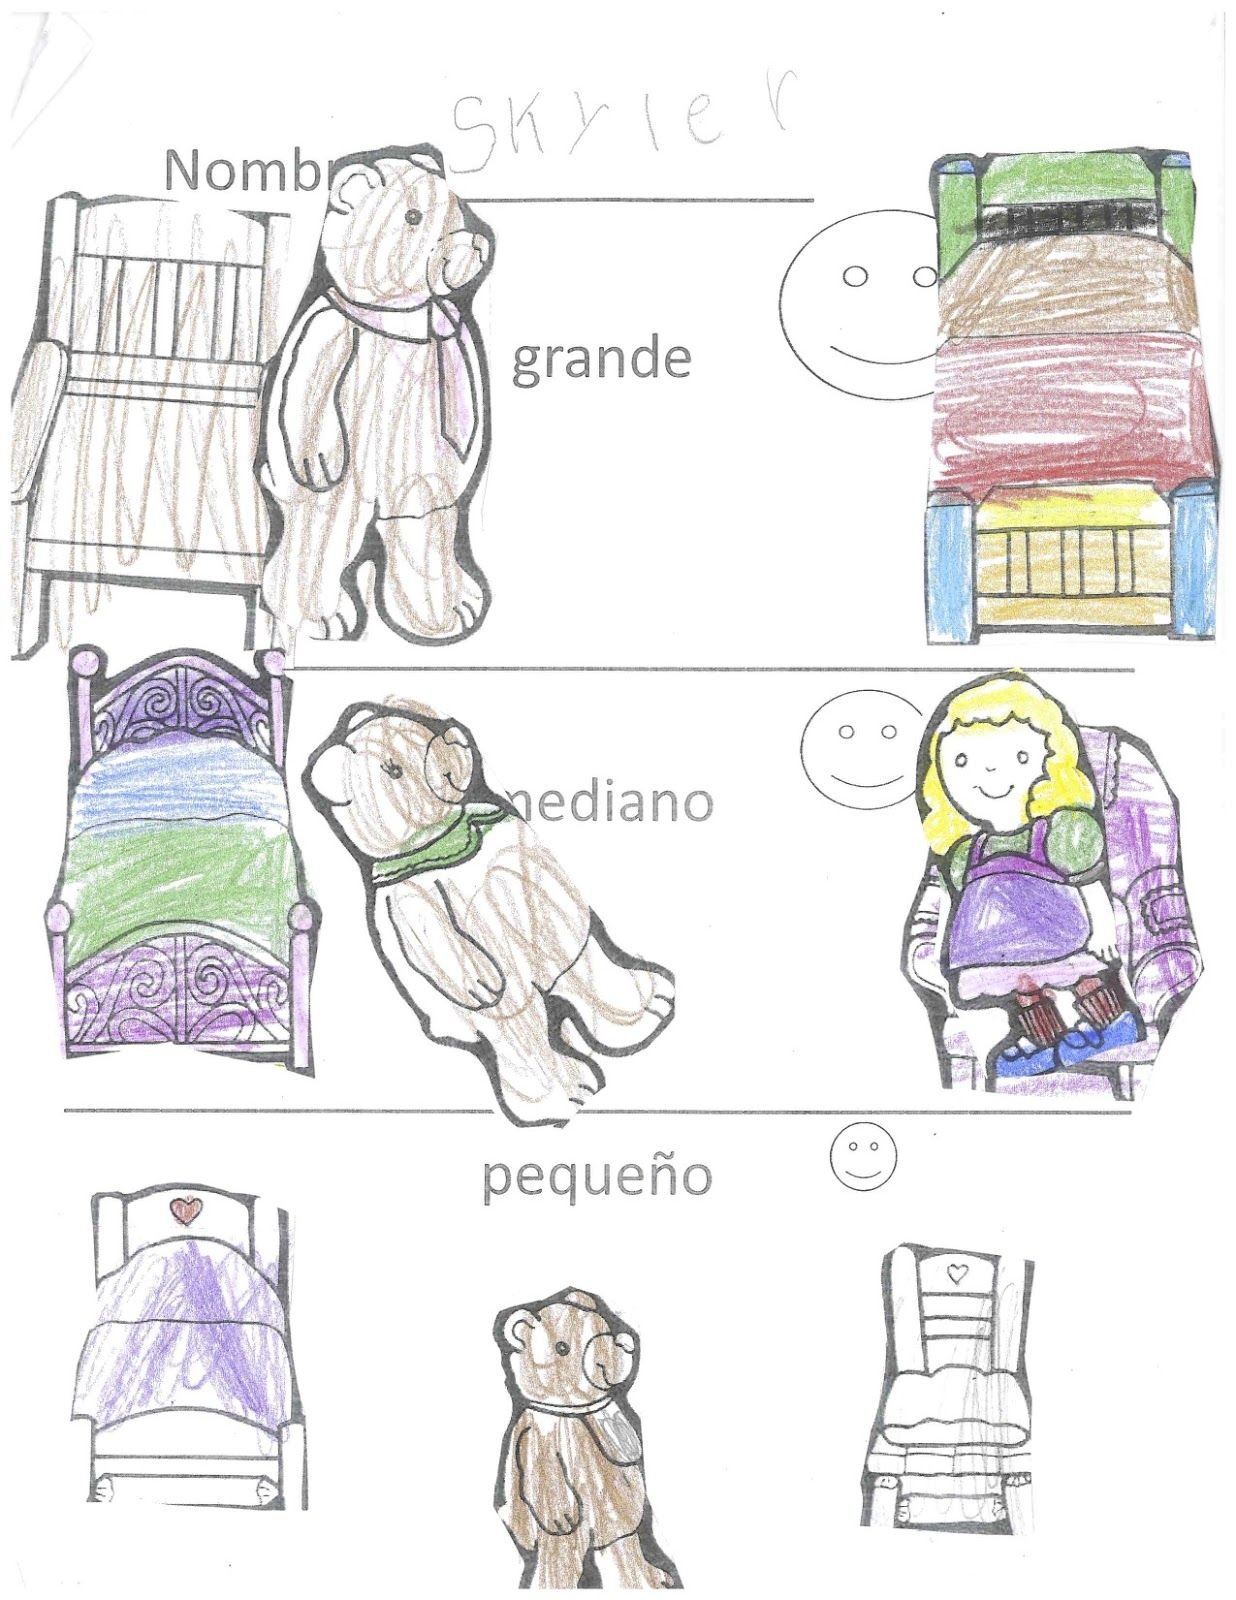 Spanish Simply Goldilocks And The Three Bears In Spanish